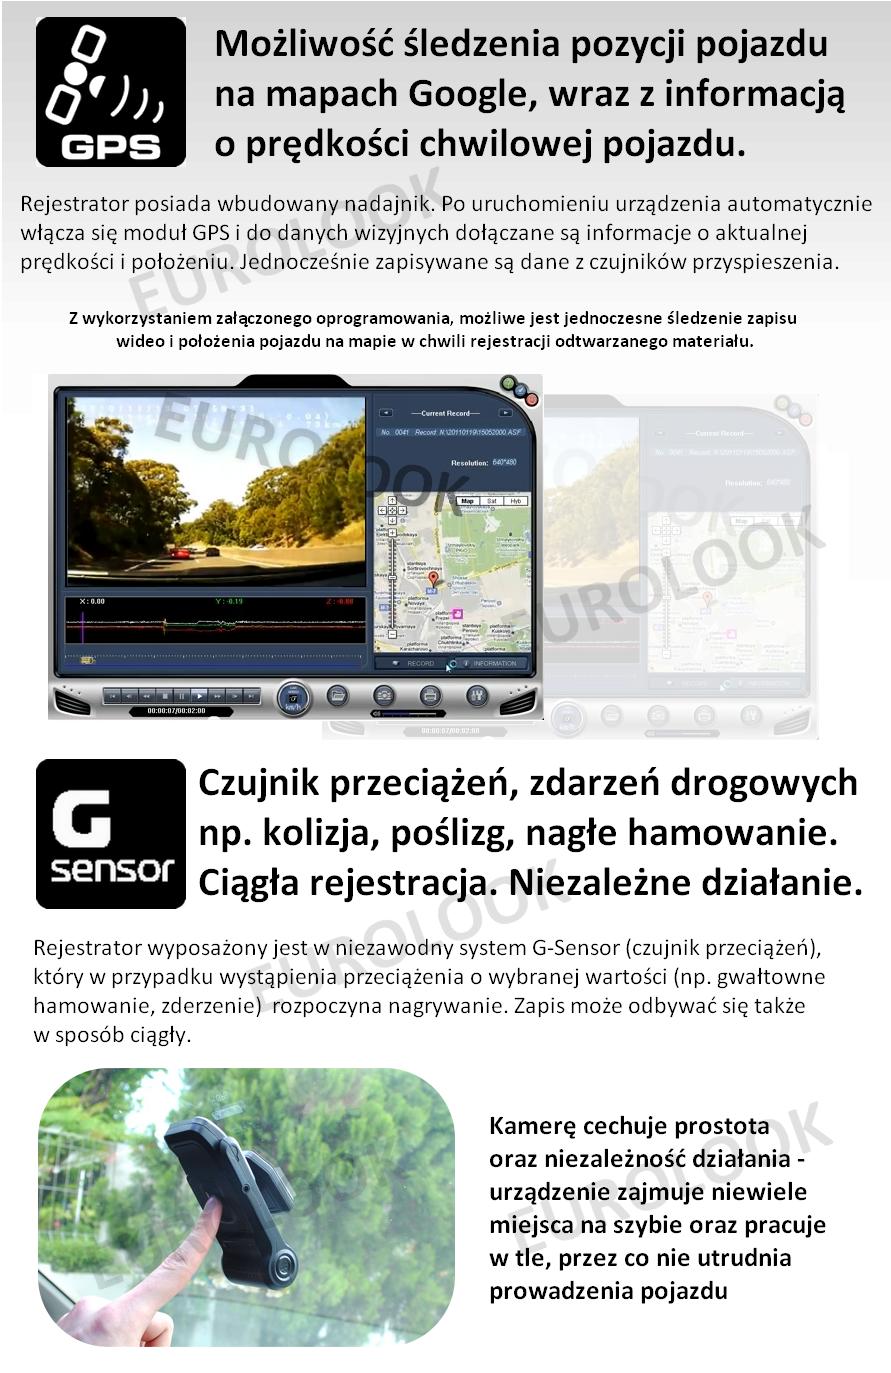 http://zdjecia.dobre-systemy.pl/gdcar/3.png